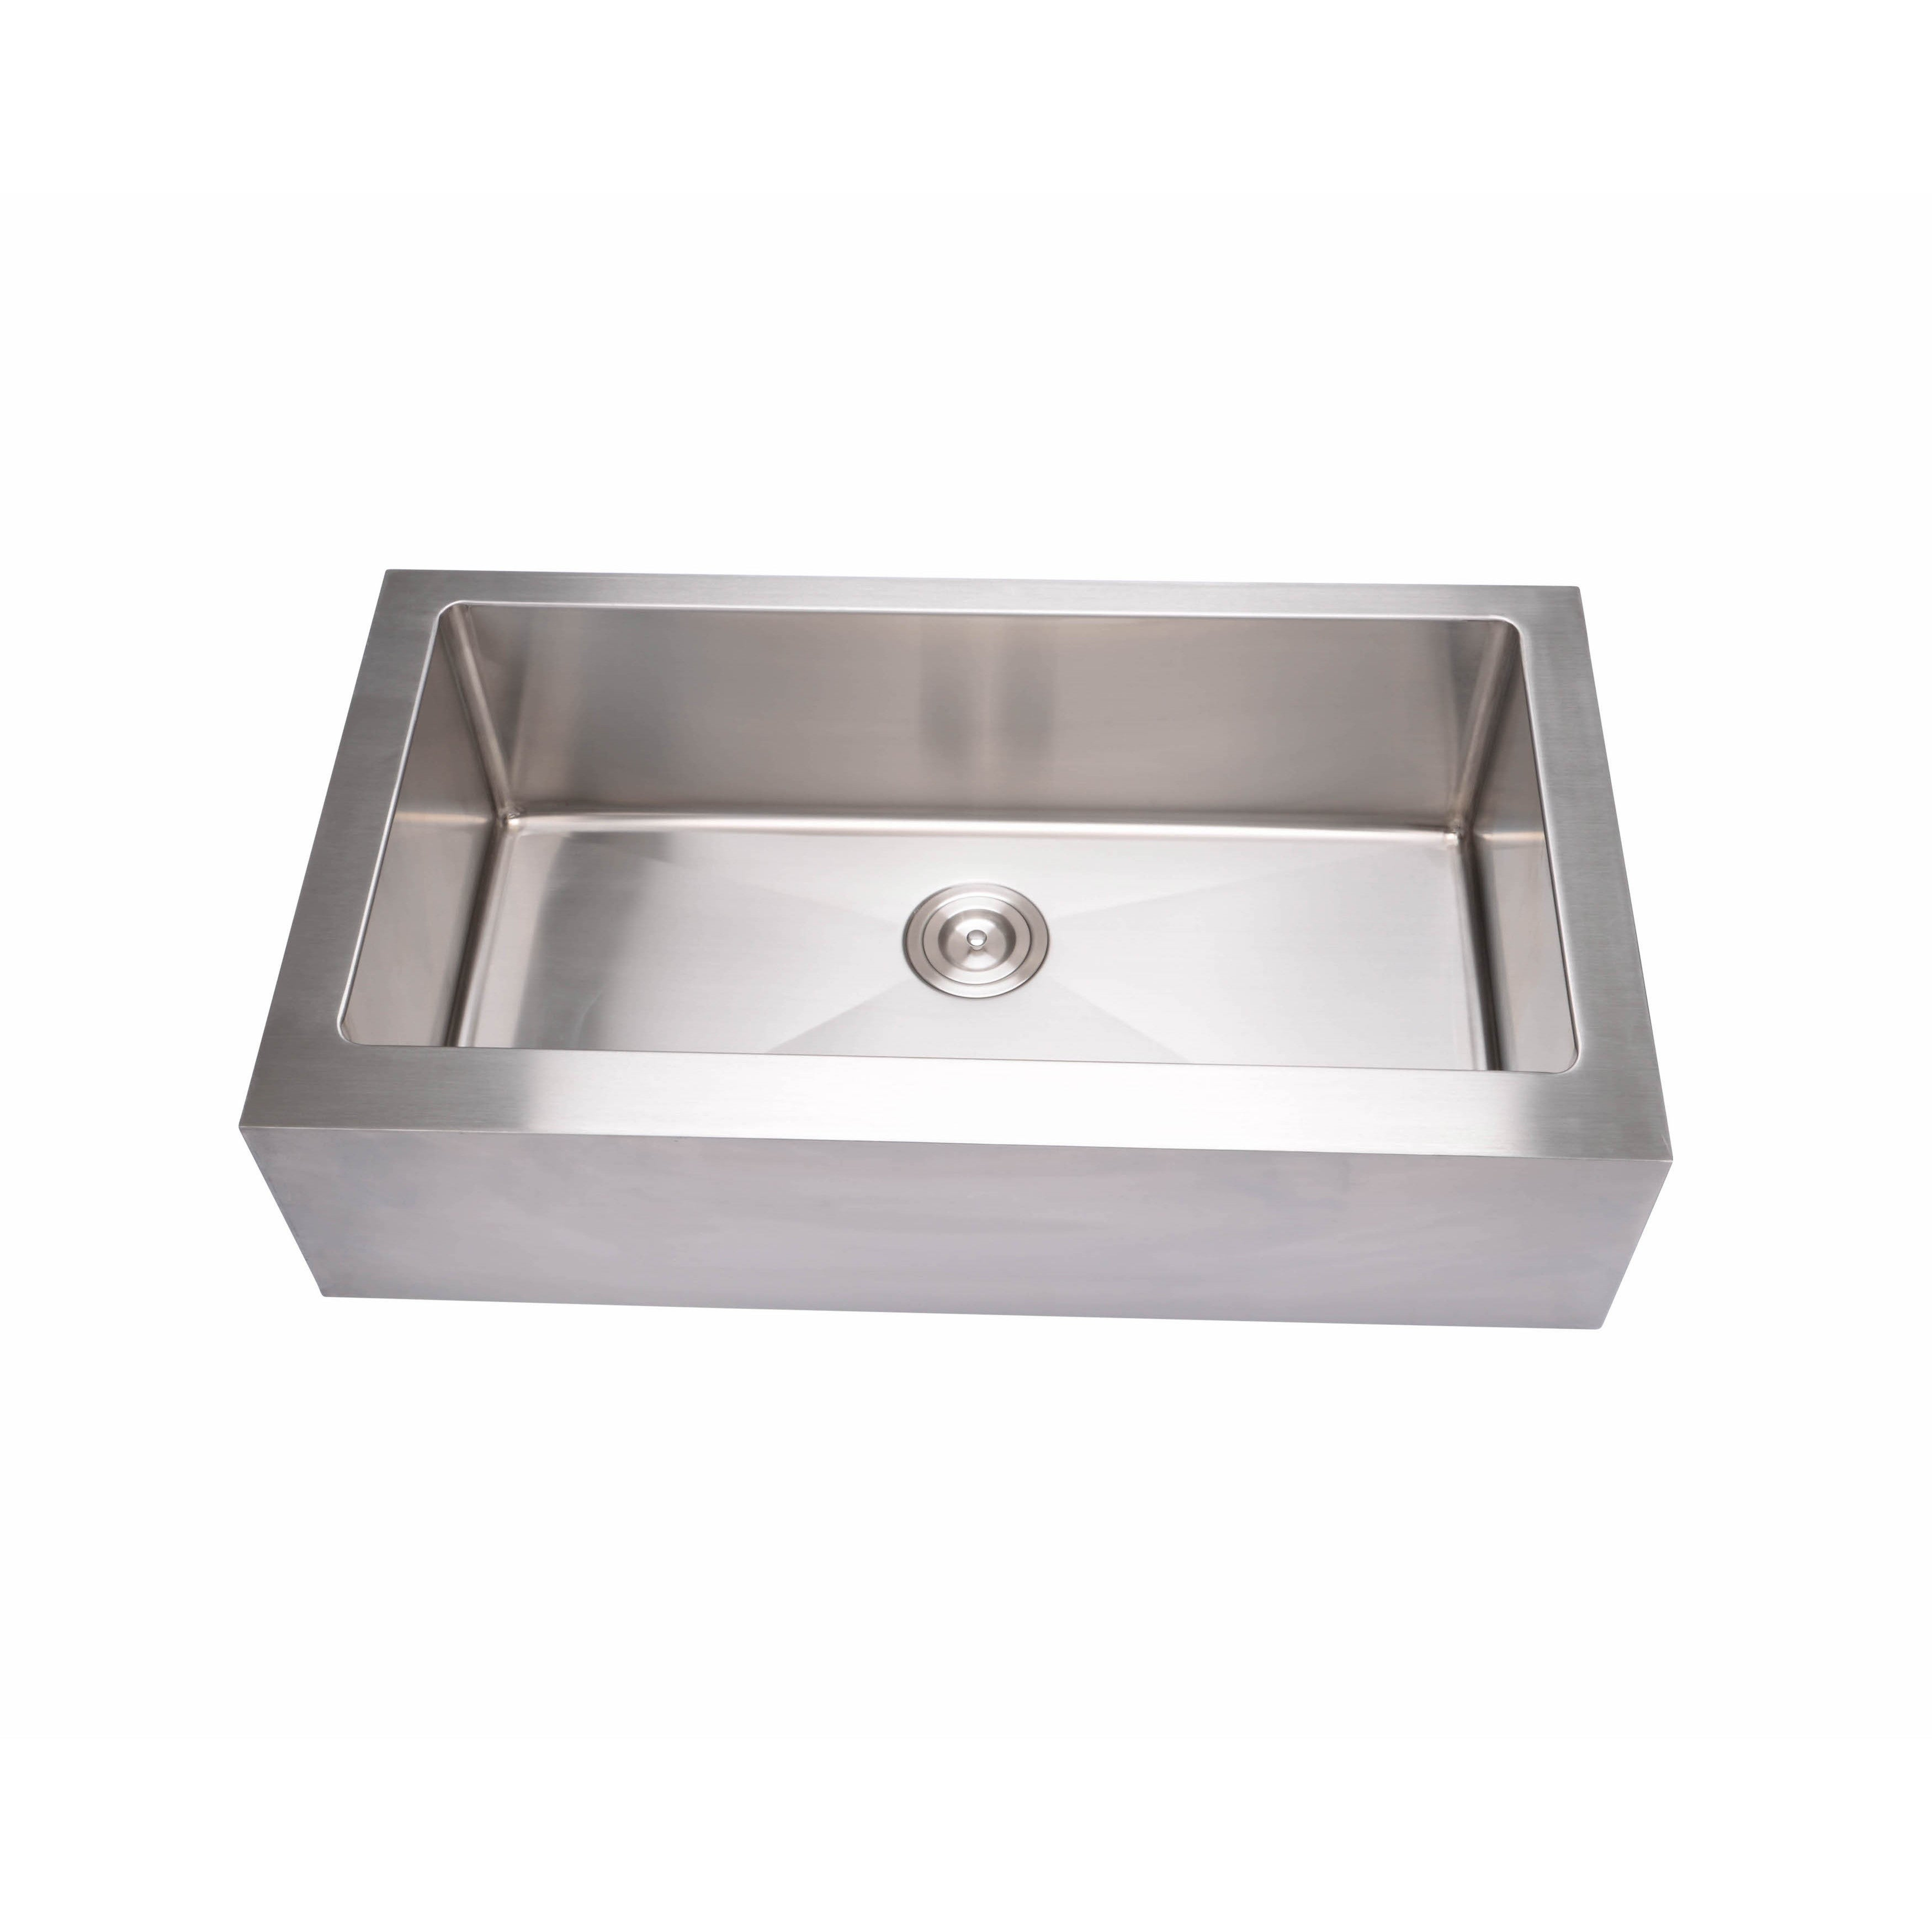 Hahn Flat apron Farmhouse Extra large Single bowl Sink Free